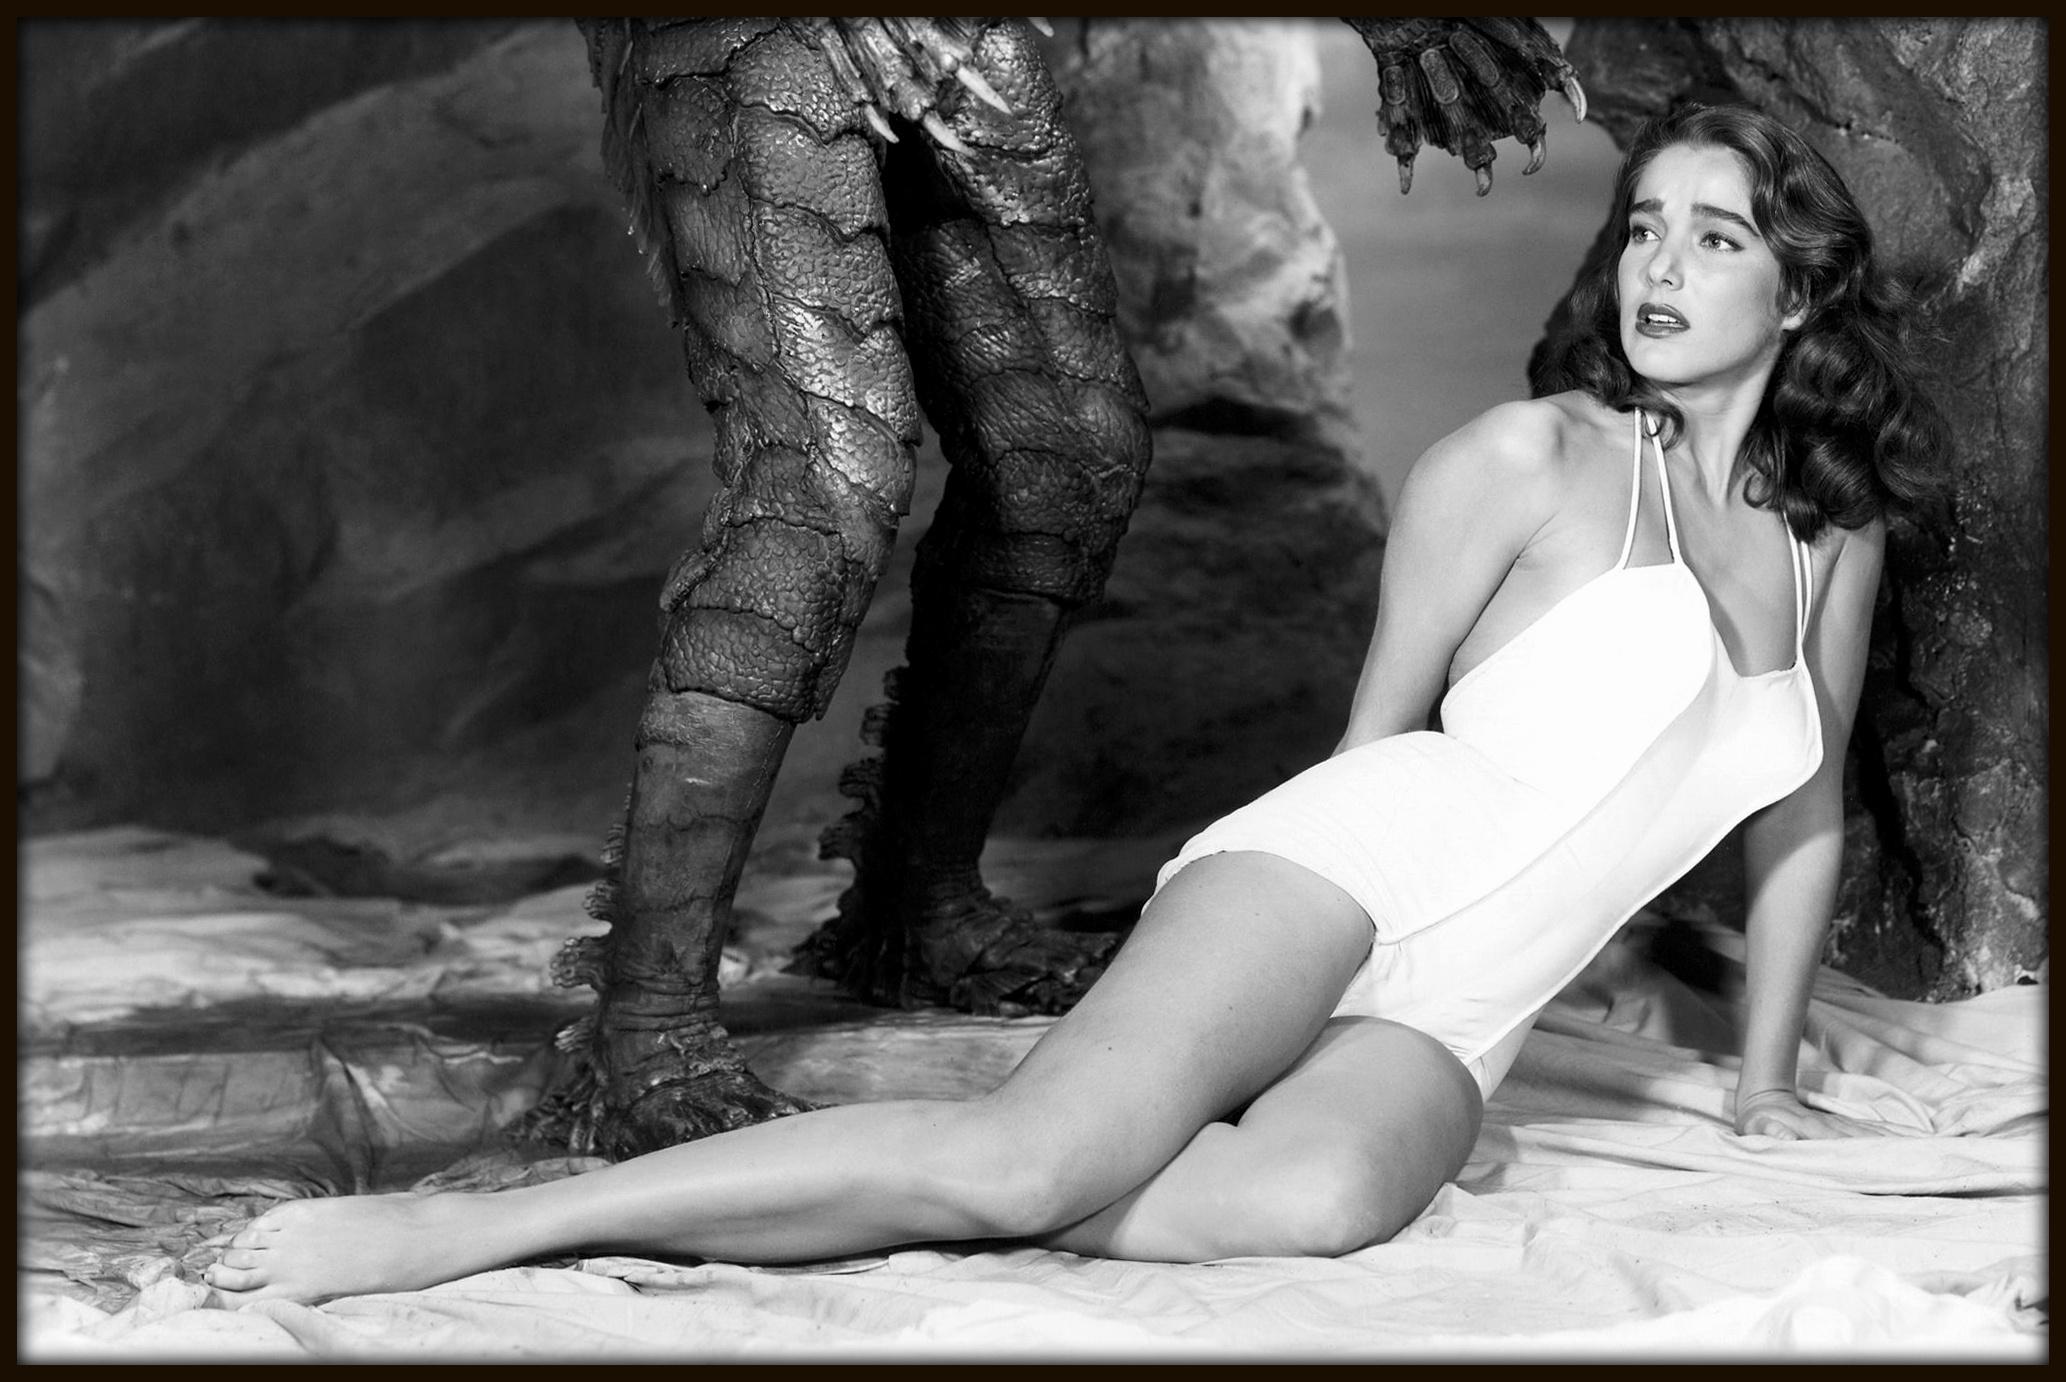 Rachel Szalay,Daisy Reyes (b. ?) Erotic video Marielle Jaffe,John Challis (born 1942)